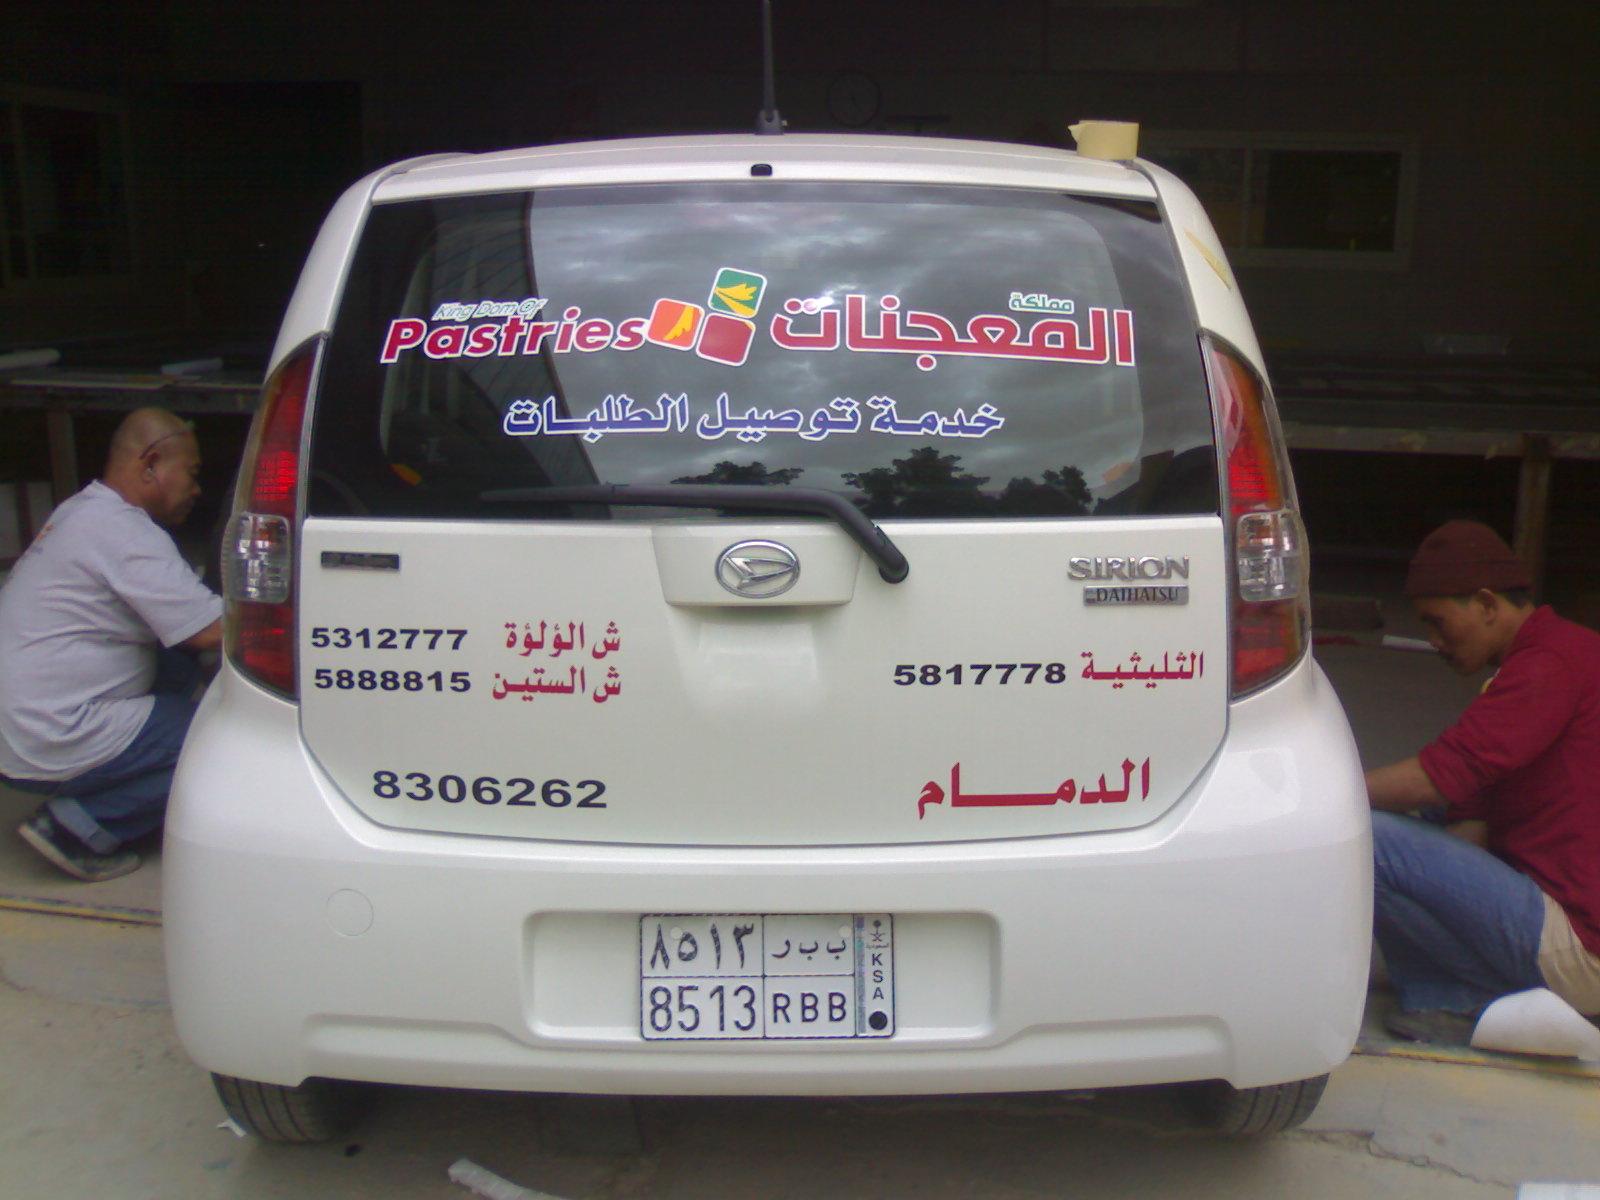 Car sticker design for swift - Car Stickers For Swift Car Stickers For Swift Daihatsu Sirion Car Sticker Best Popular Car